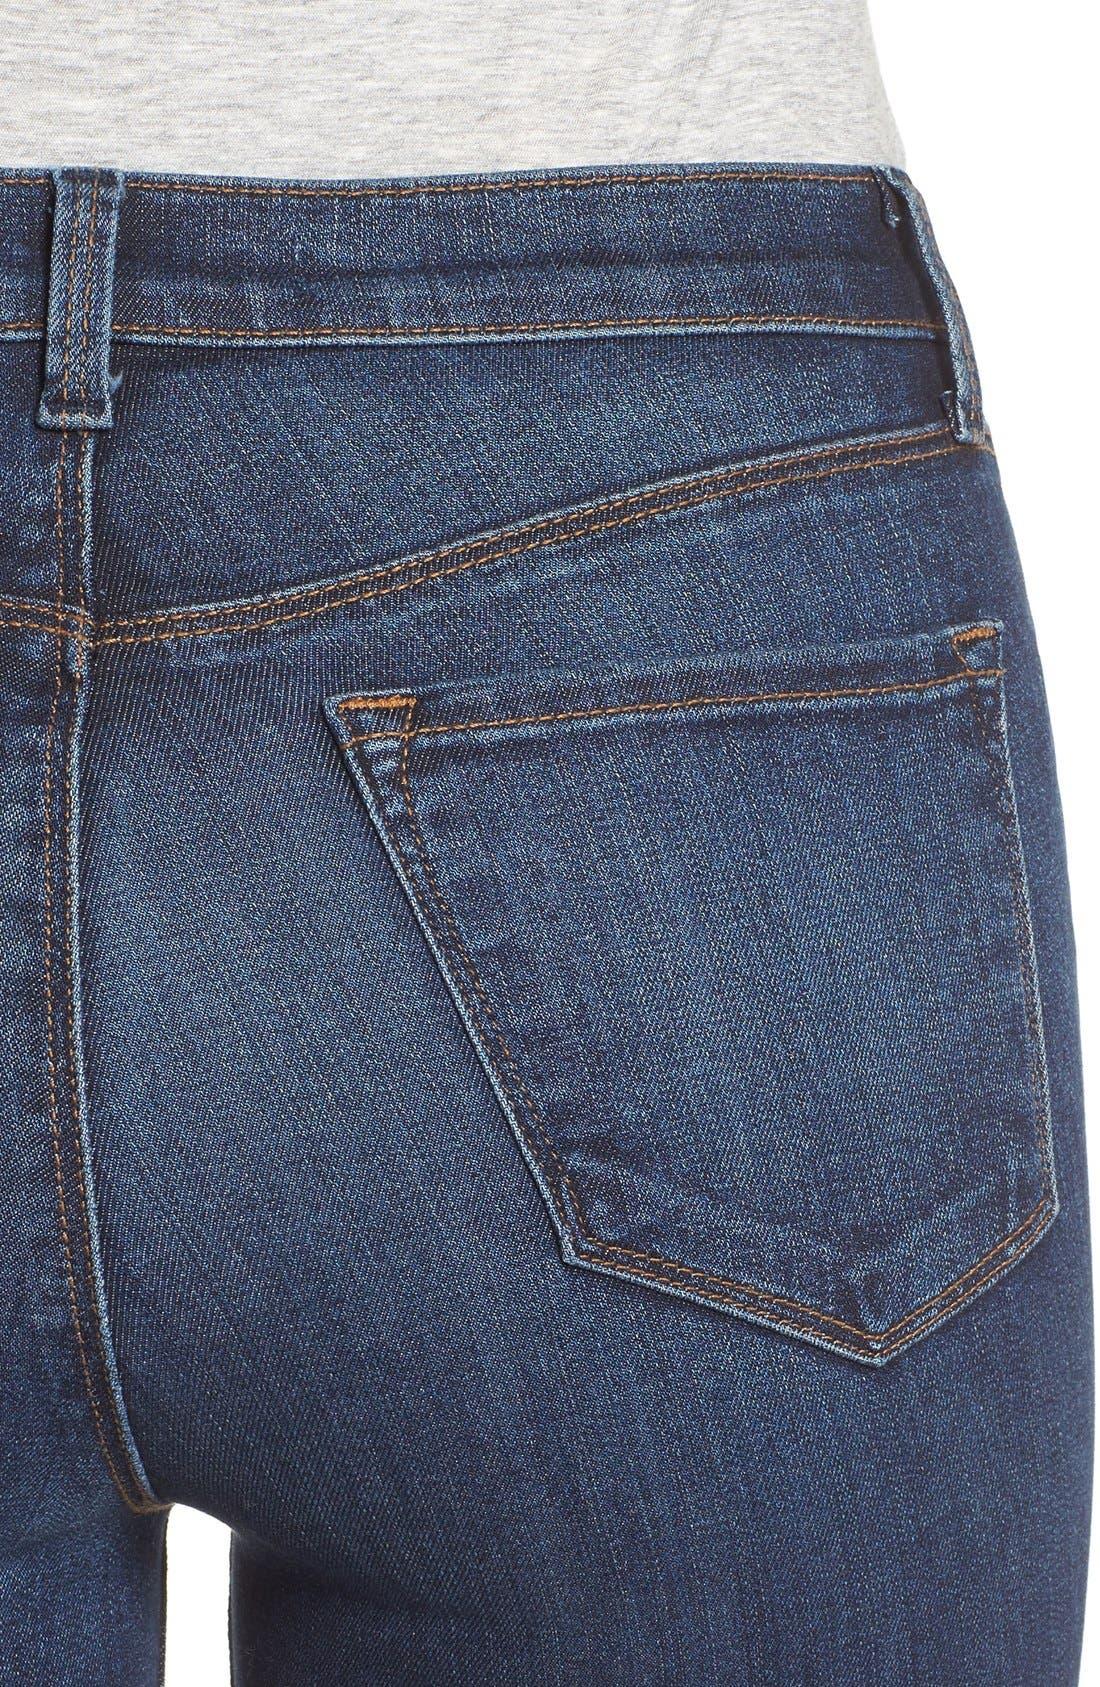 Alternate Image 4  - J Brand Maria High Waist Skinny Jeans (Fleeting)